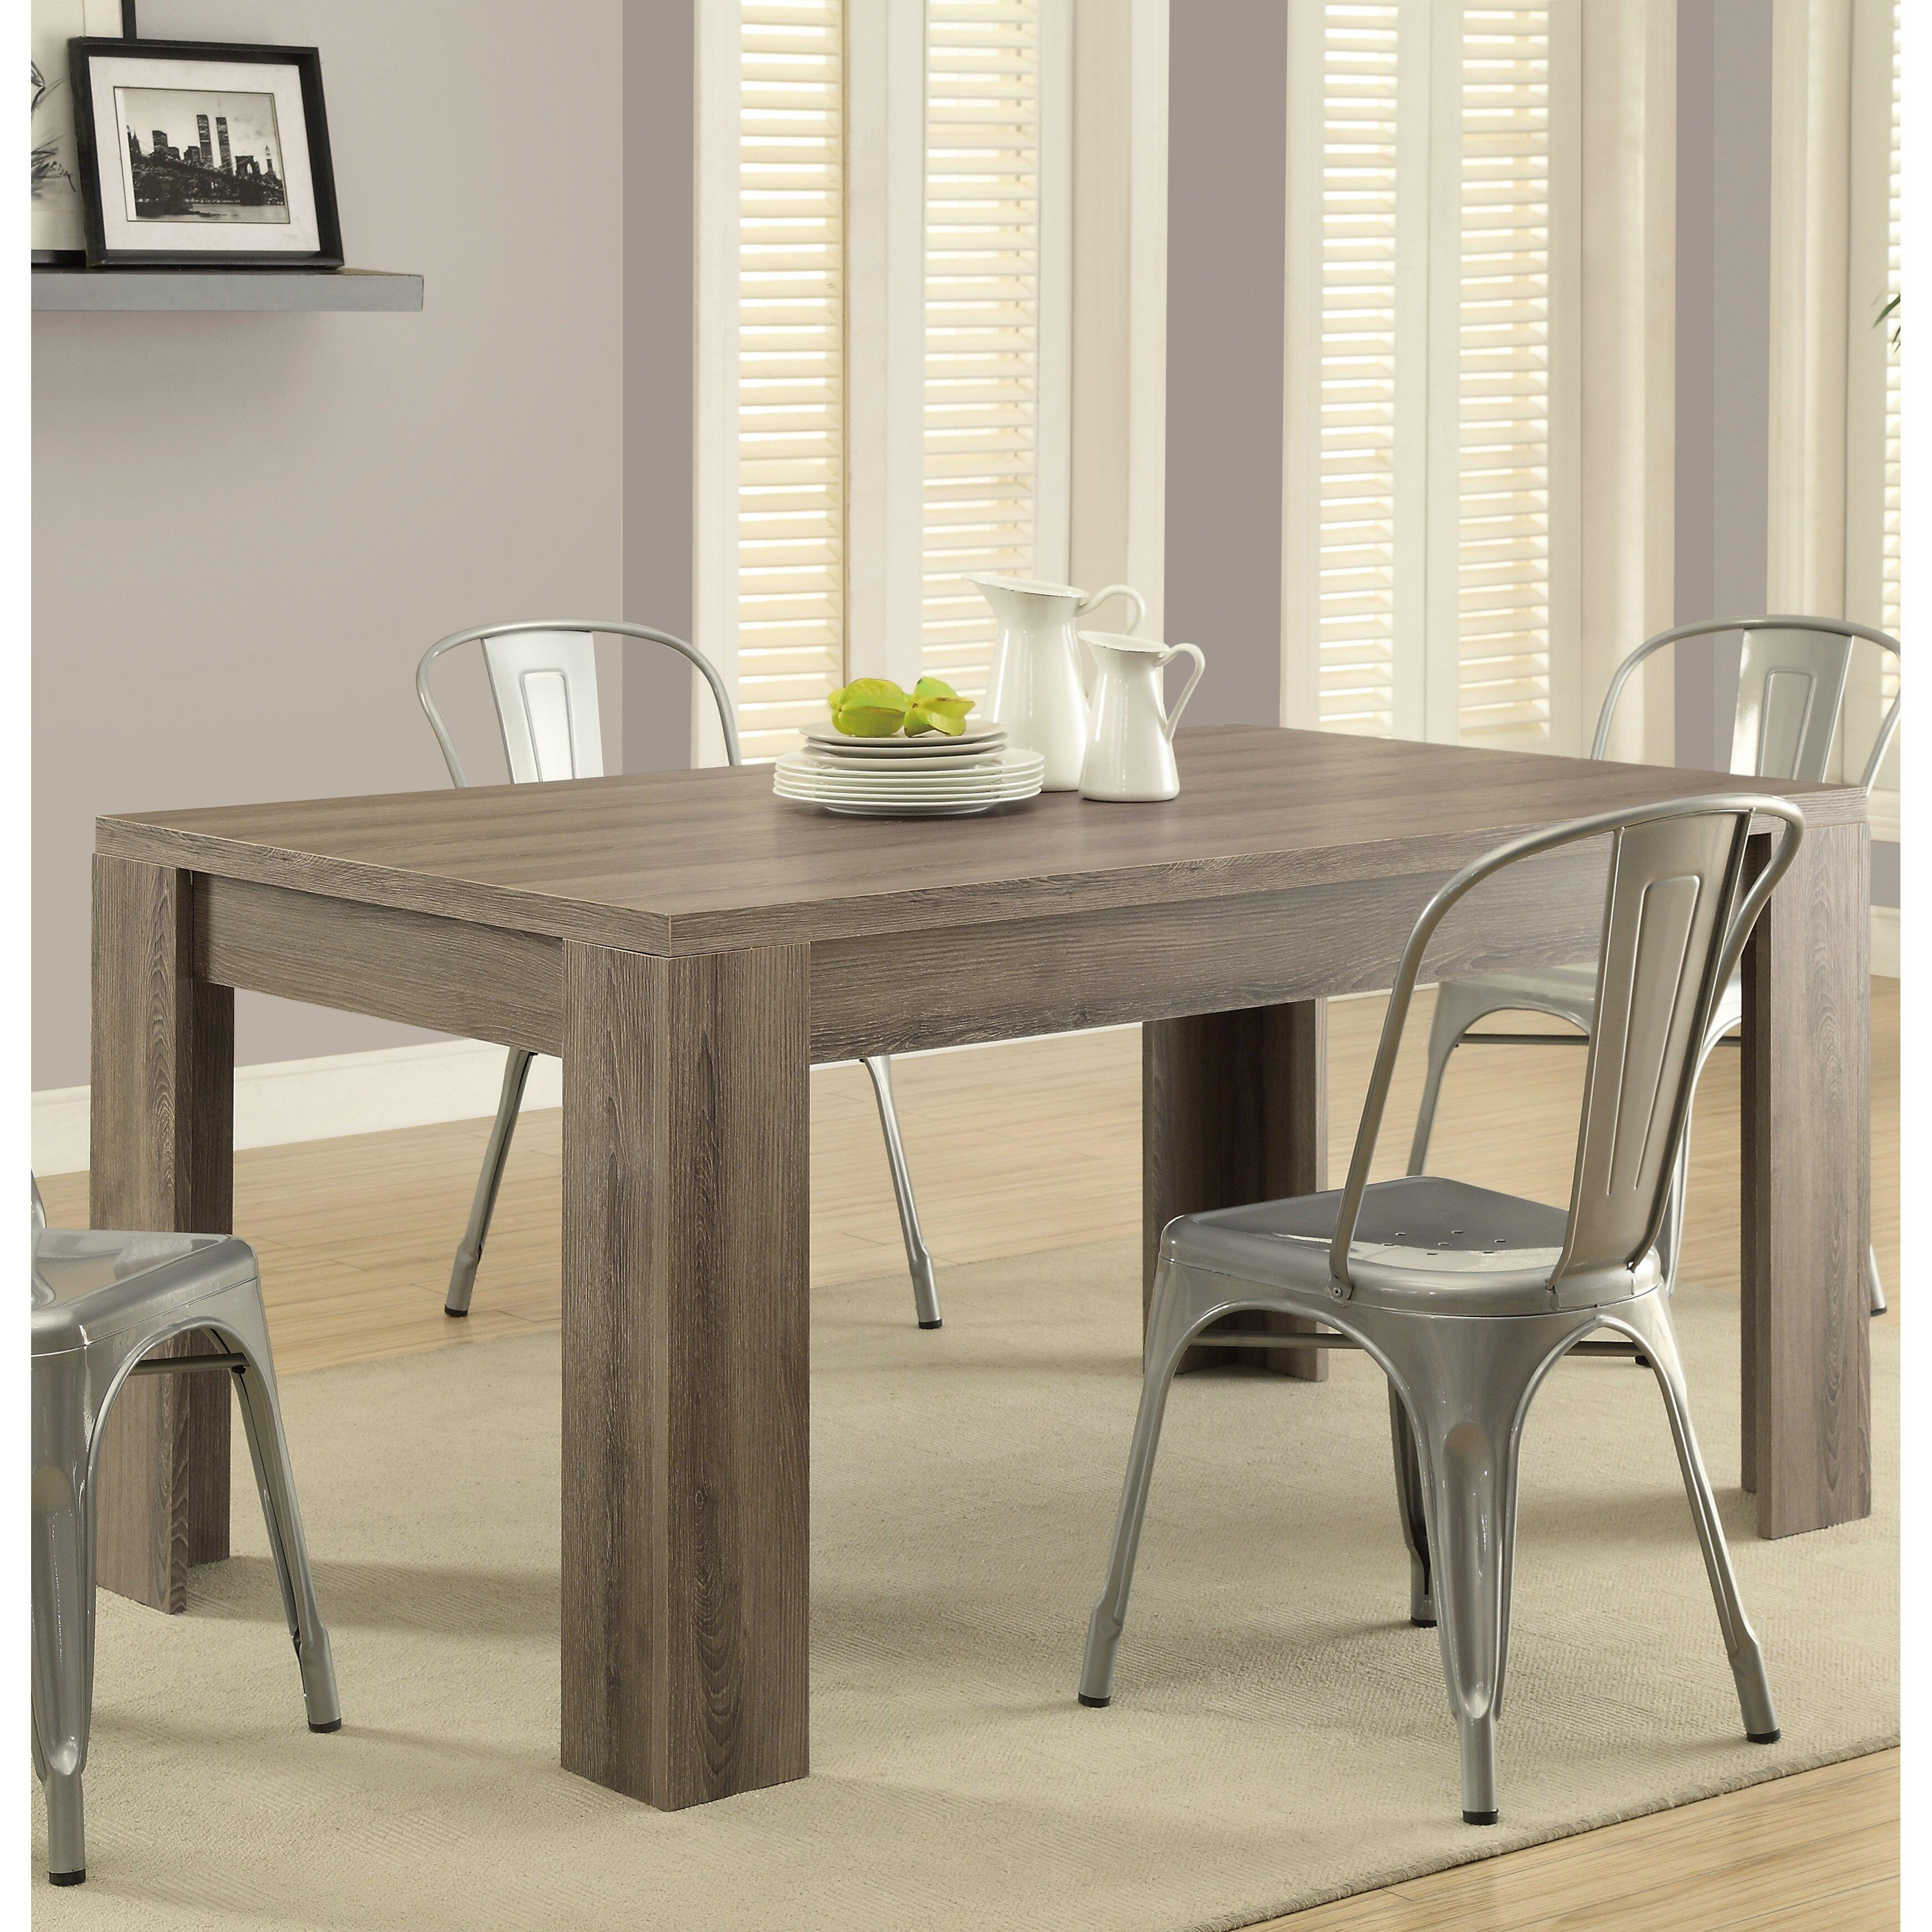 trent austin design kamakou dining table